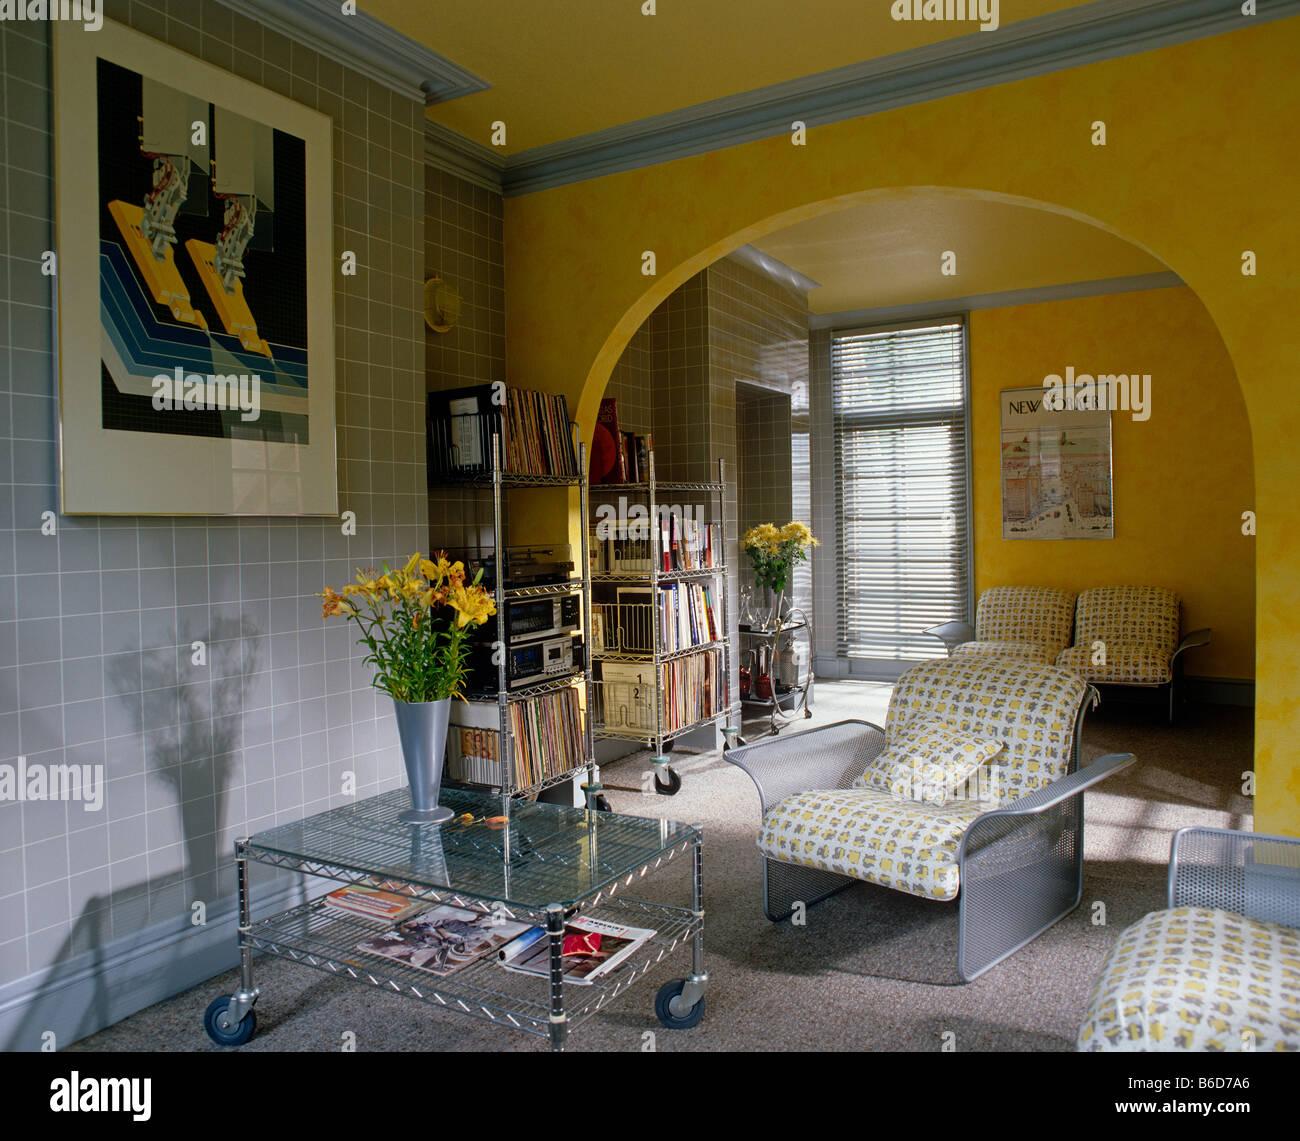 Eighties Style Living Room Interior - Stock Image